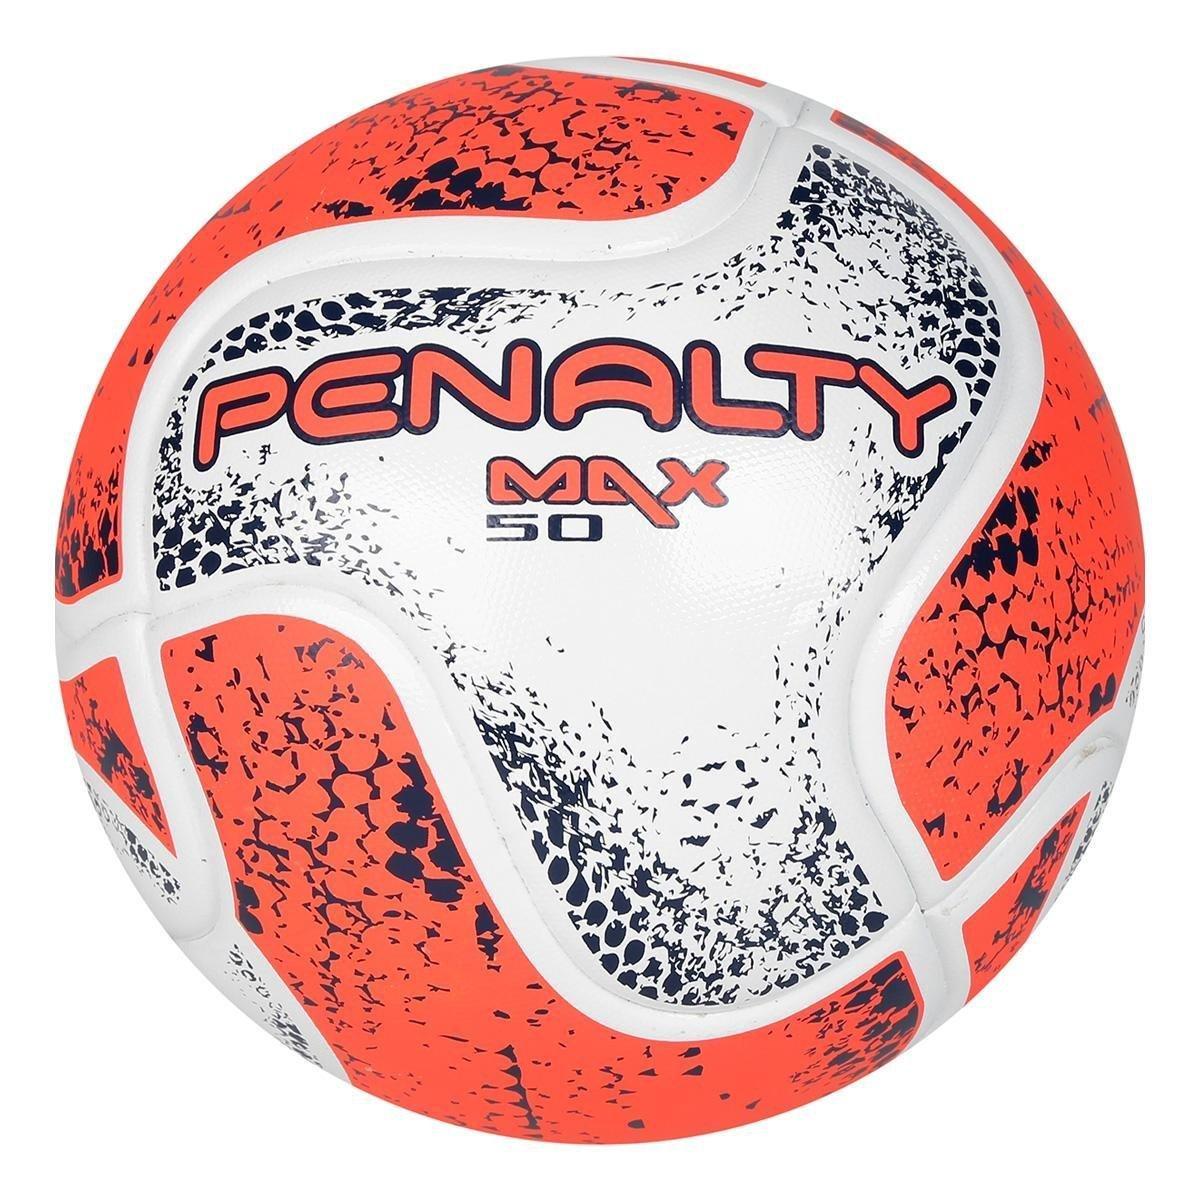 93f642dcd6 Bola Futsal Penalty Max 50 CBFS VIII - Branco e Laranja - Compre ...